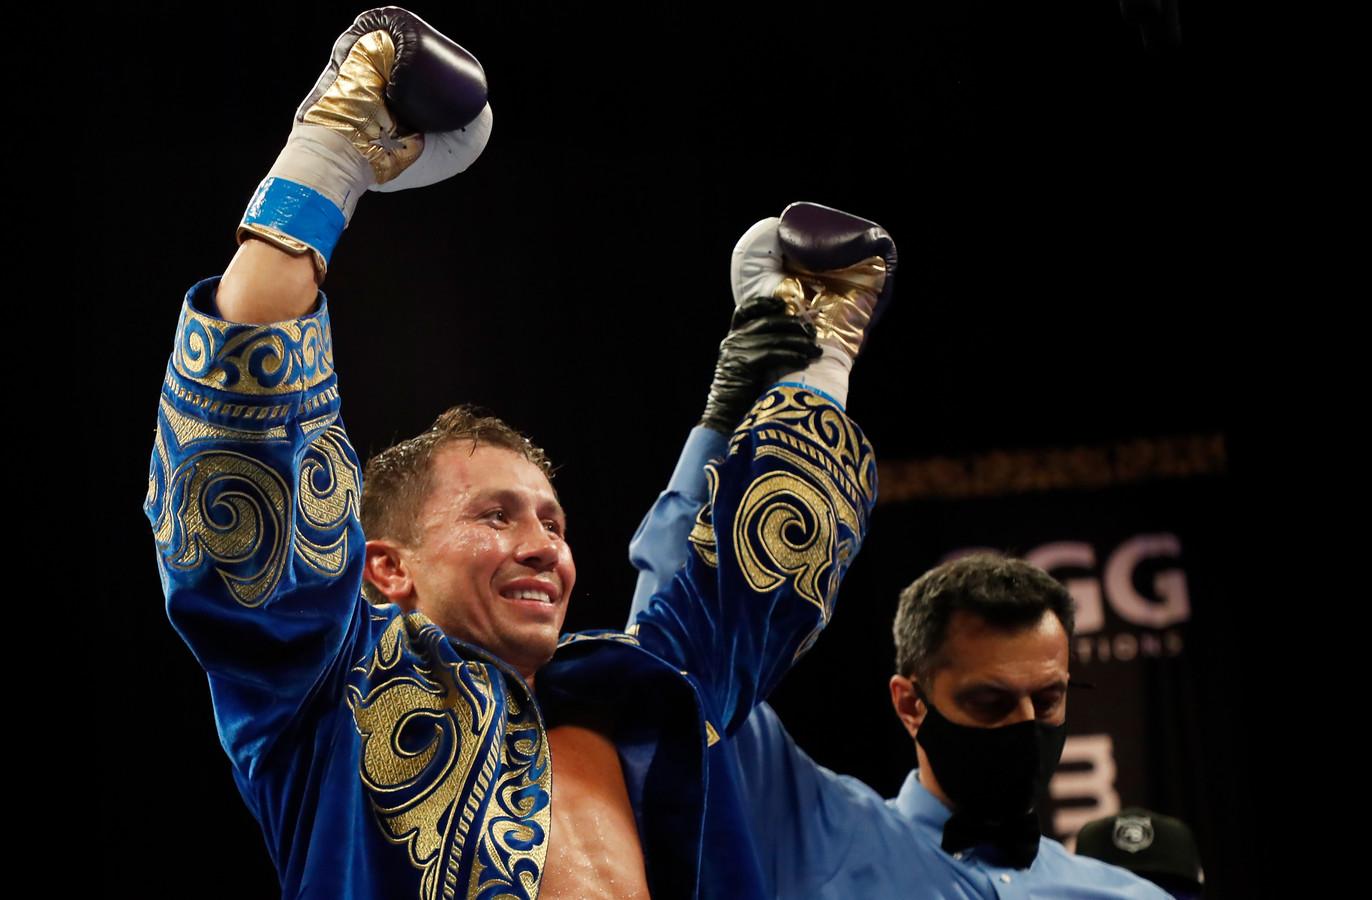 Gennadiy Golovkin viert het verslaan van Kamil Szeremeta in hun IBF middengewicht titelgevecht in het Seminole Hard Rock Hotel & Casino op 18 december 2020 in Hollywood, Florida.